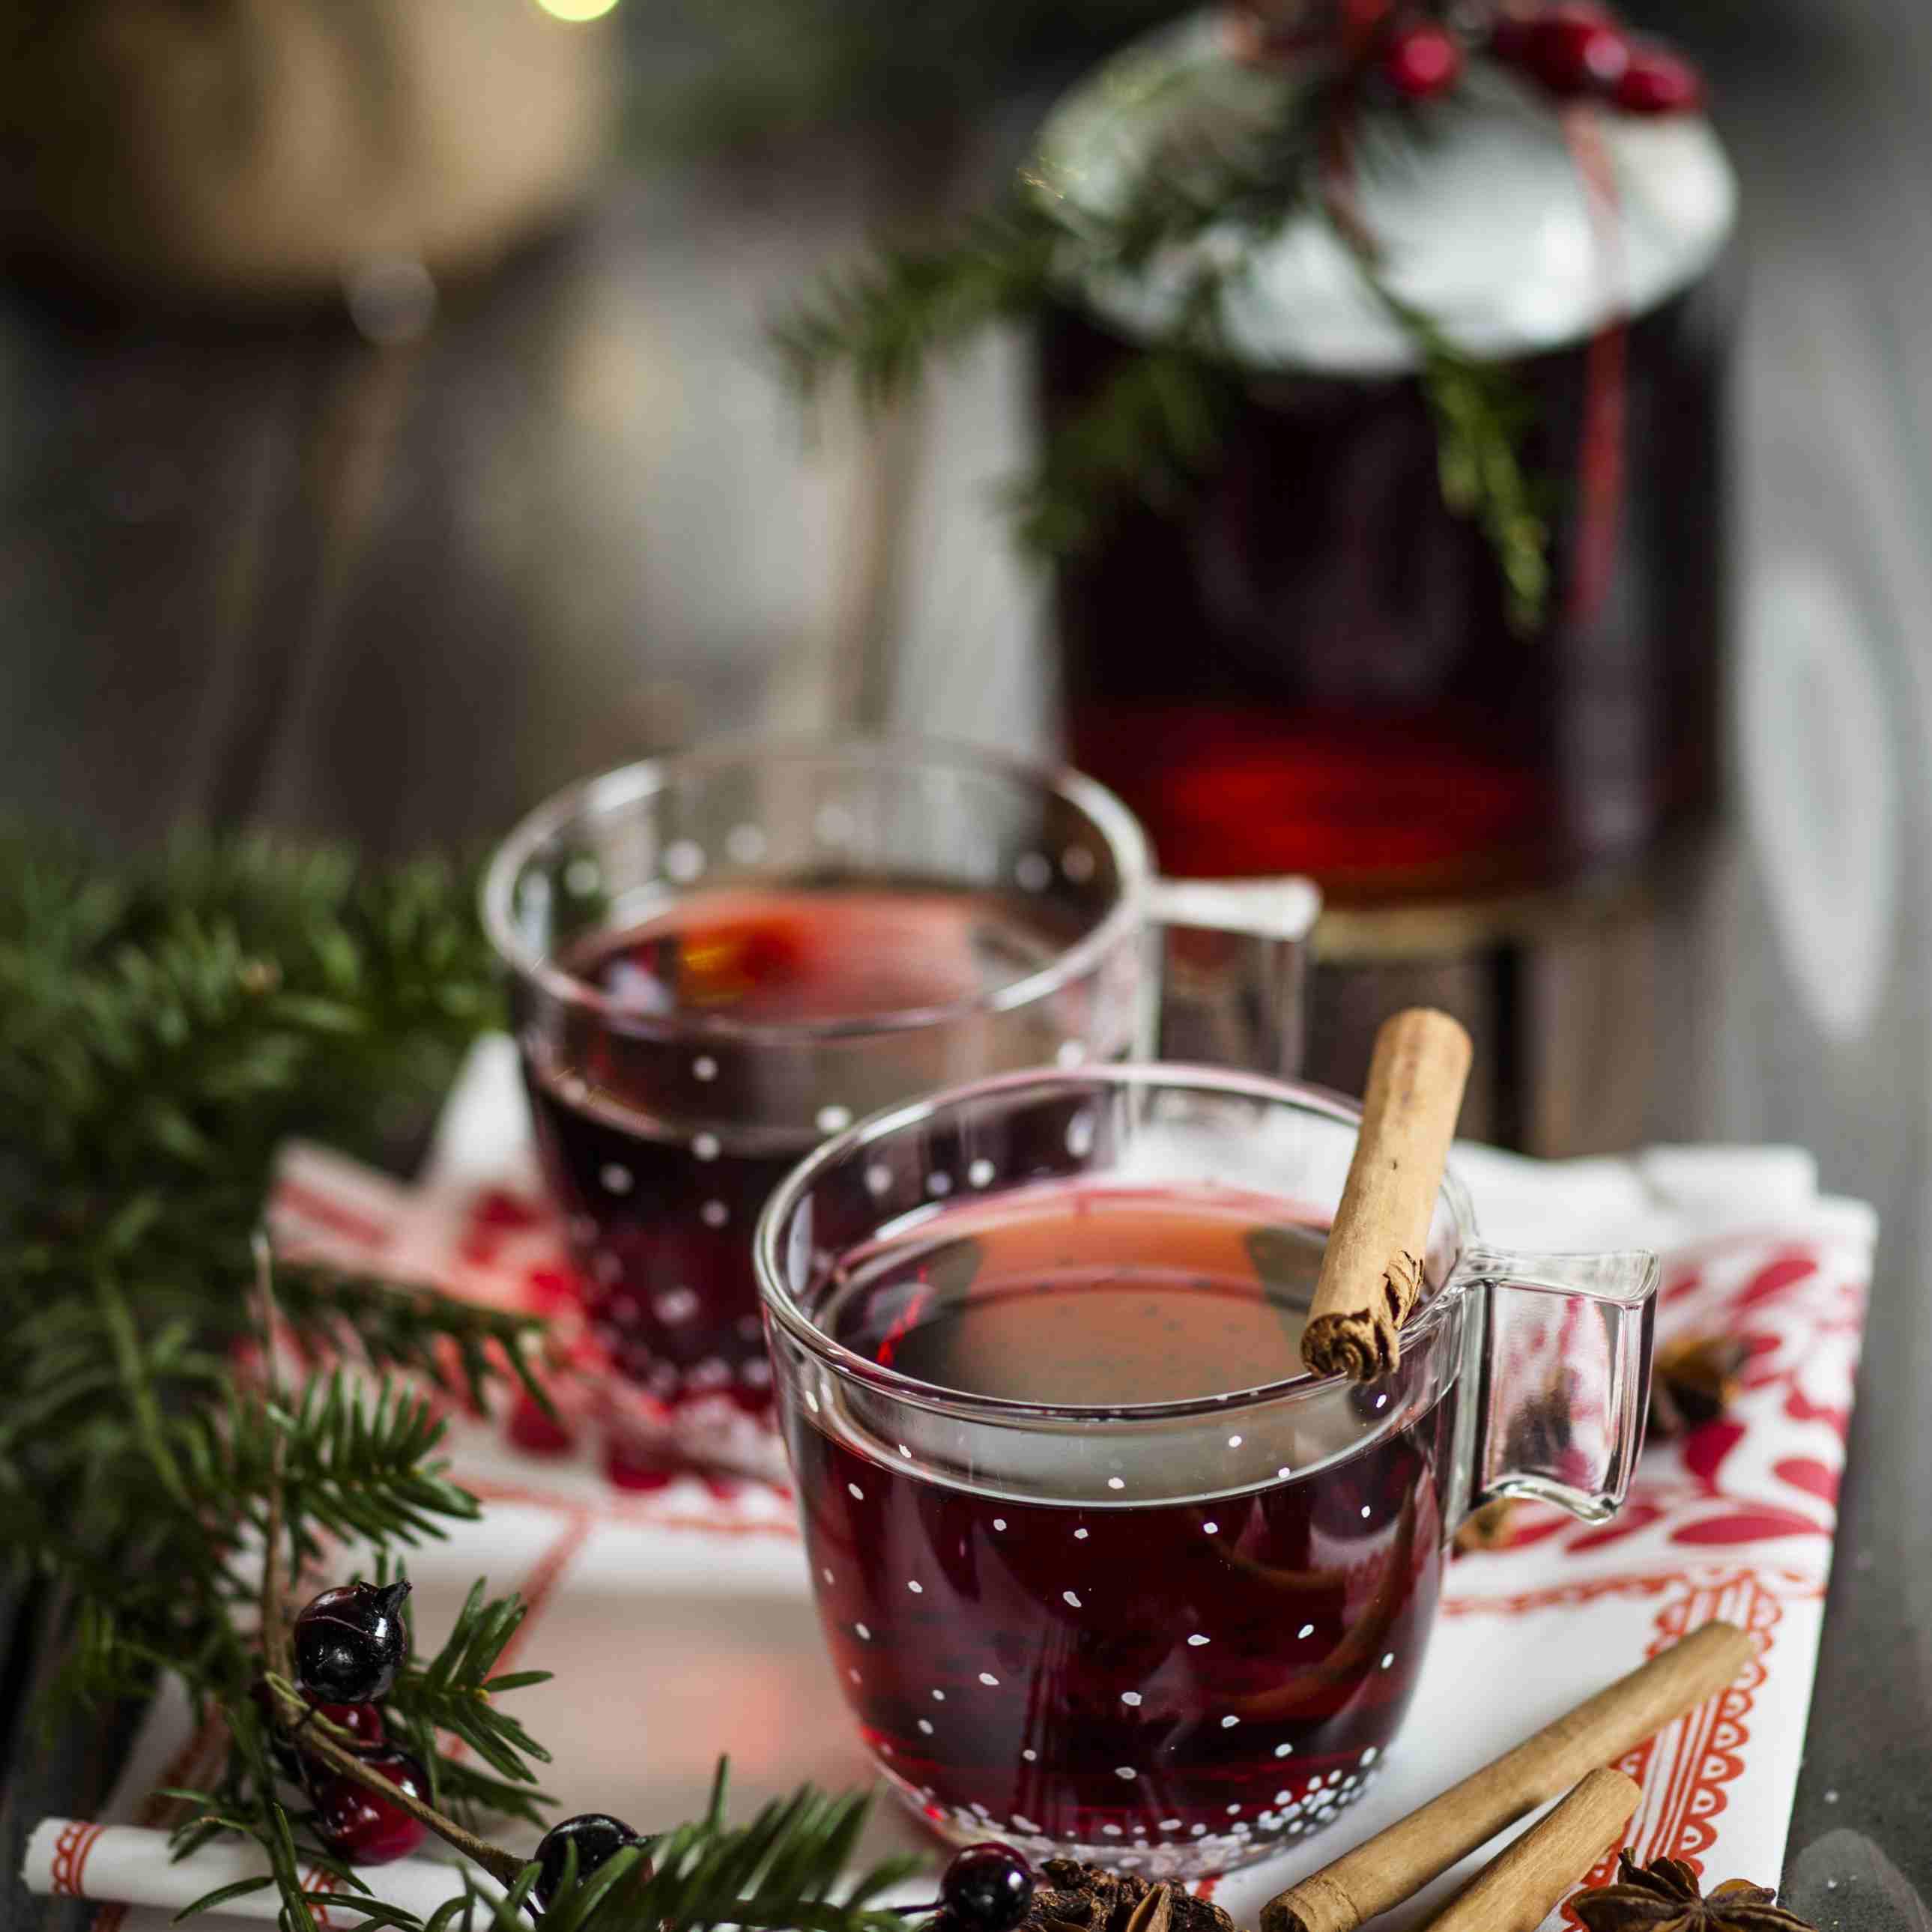 Vin brule - Italian mulled wine